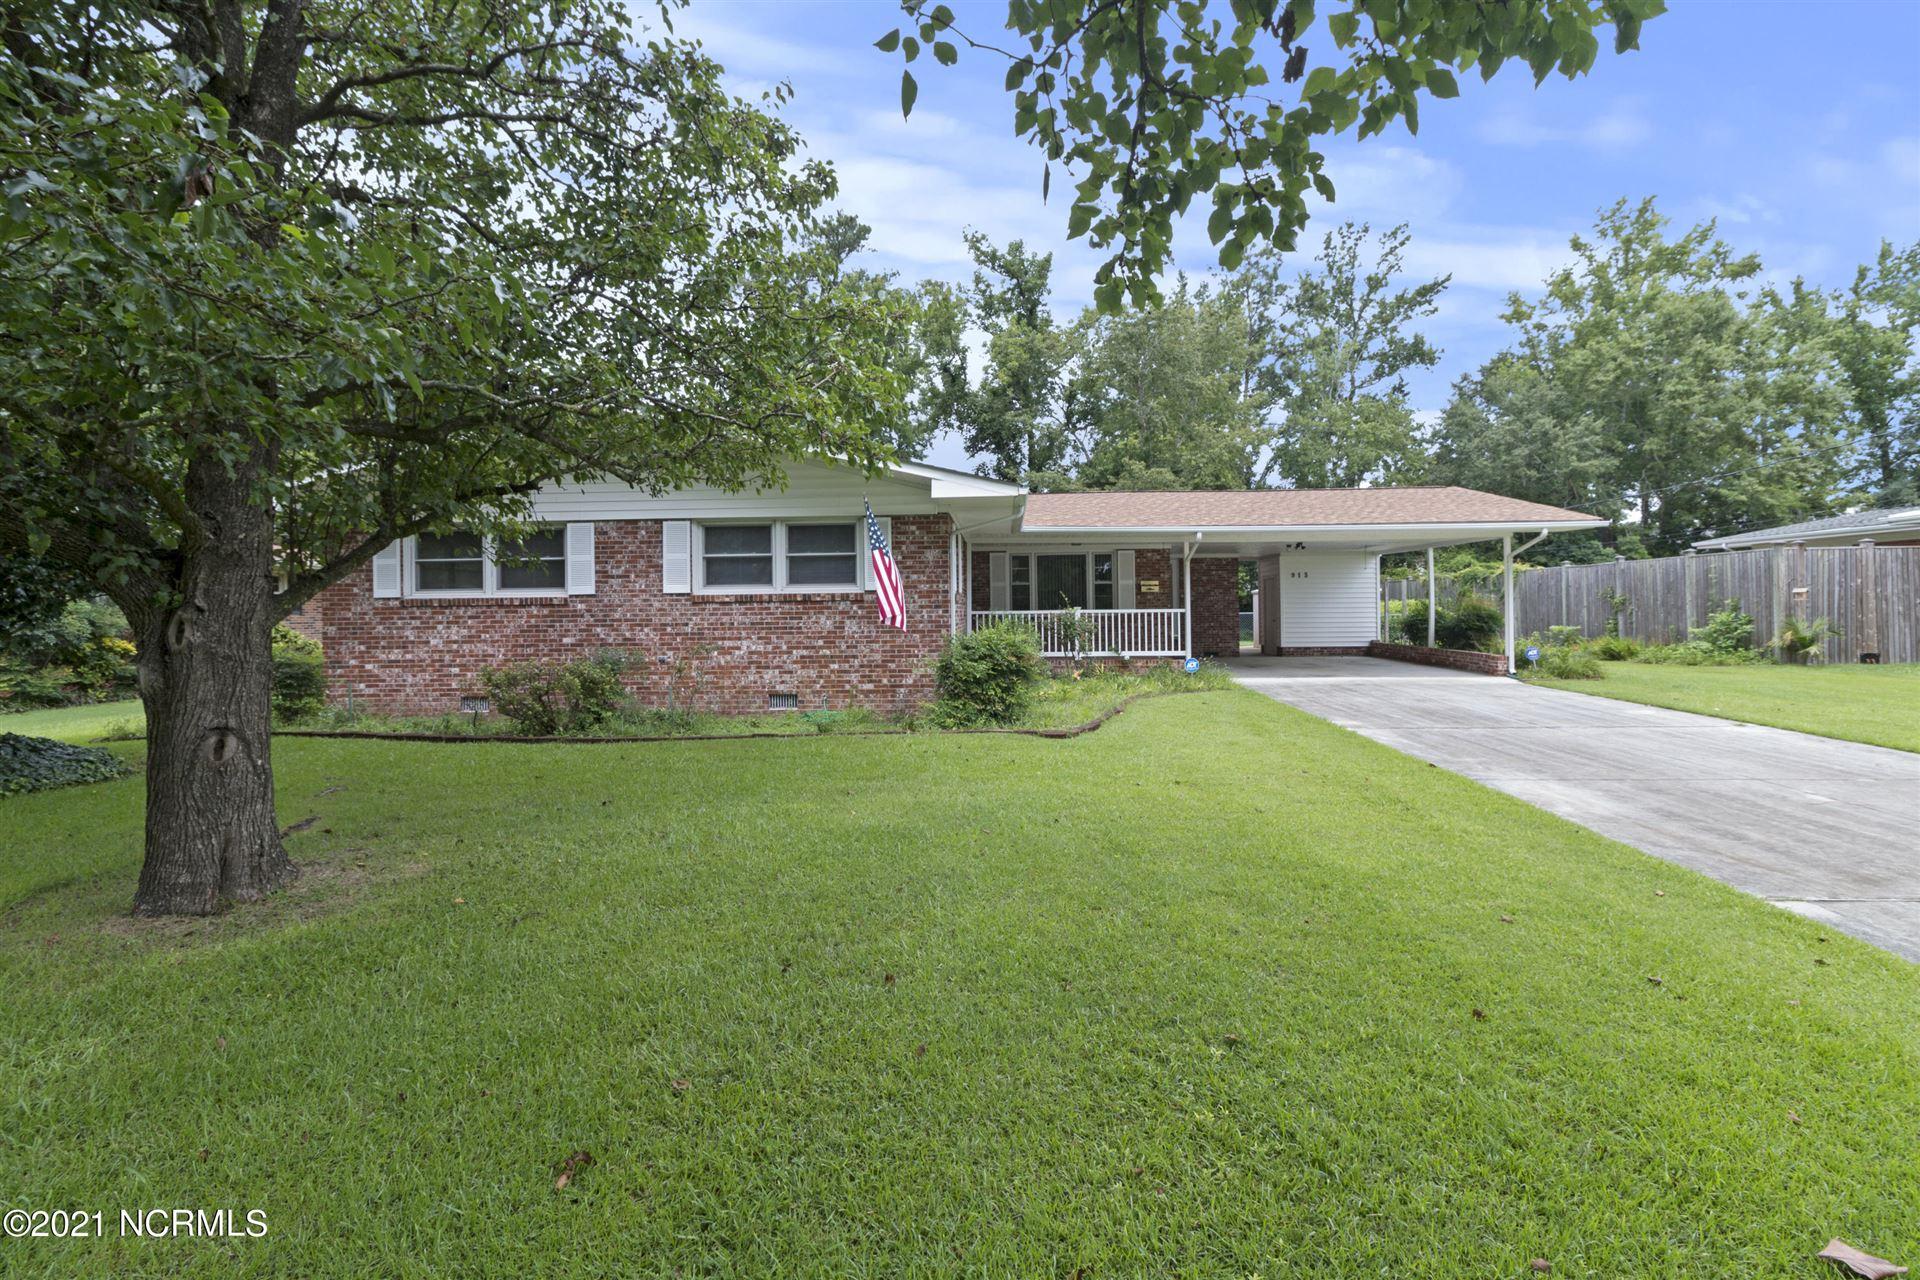 Photo of 913 Vernon Drive, Jacksonville, NC 28540 (MLS # 100282762)